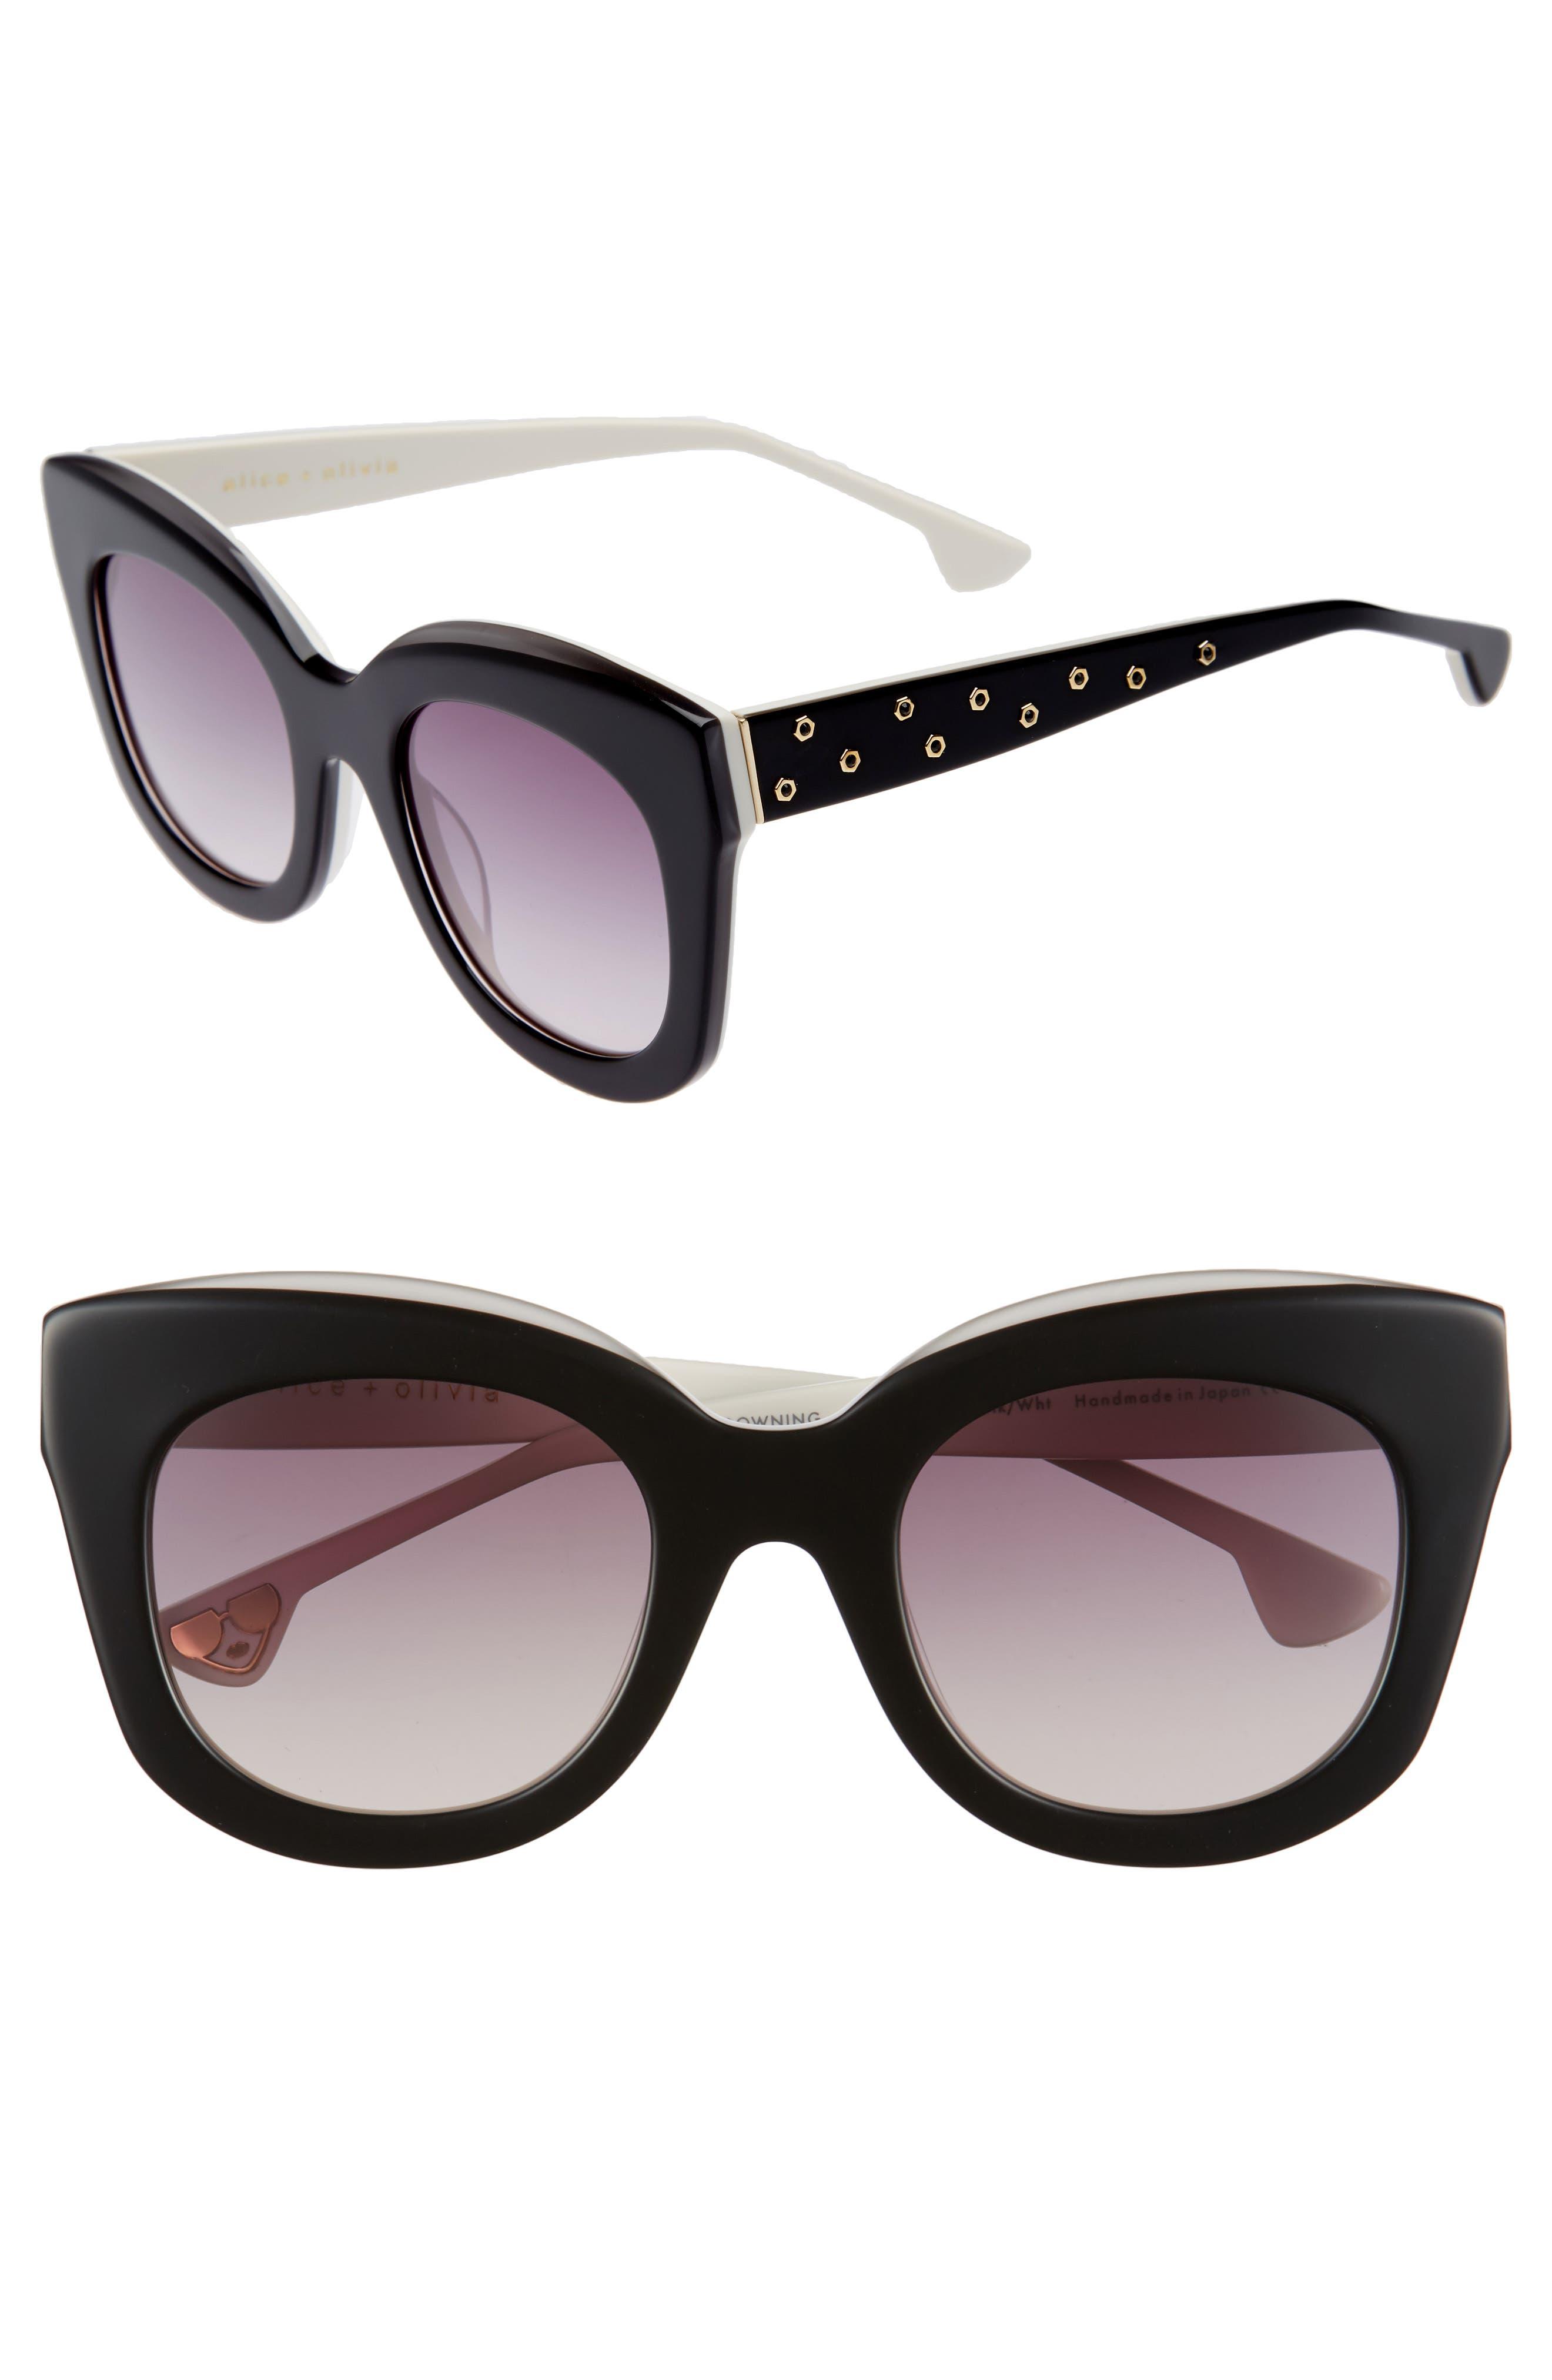 Downing 51mm Cat Eye Sunglasses,                             Main thumbnail 1, color,                             Black/ White